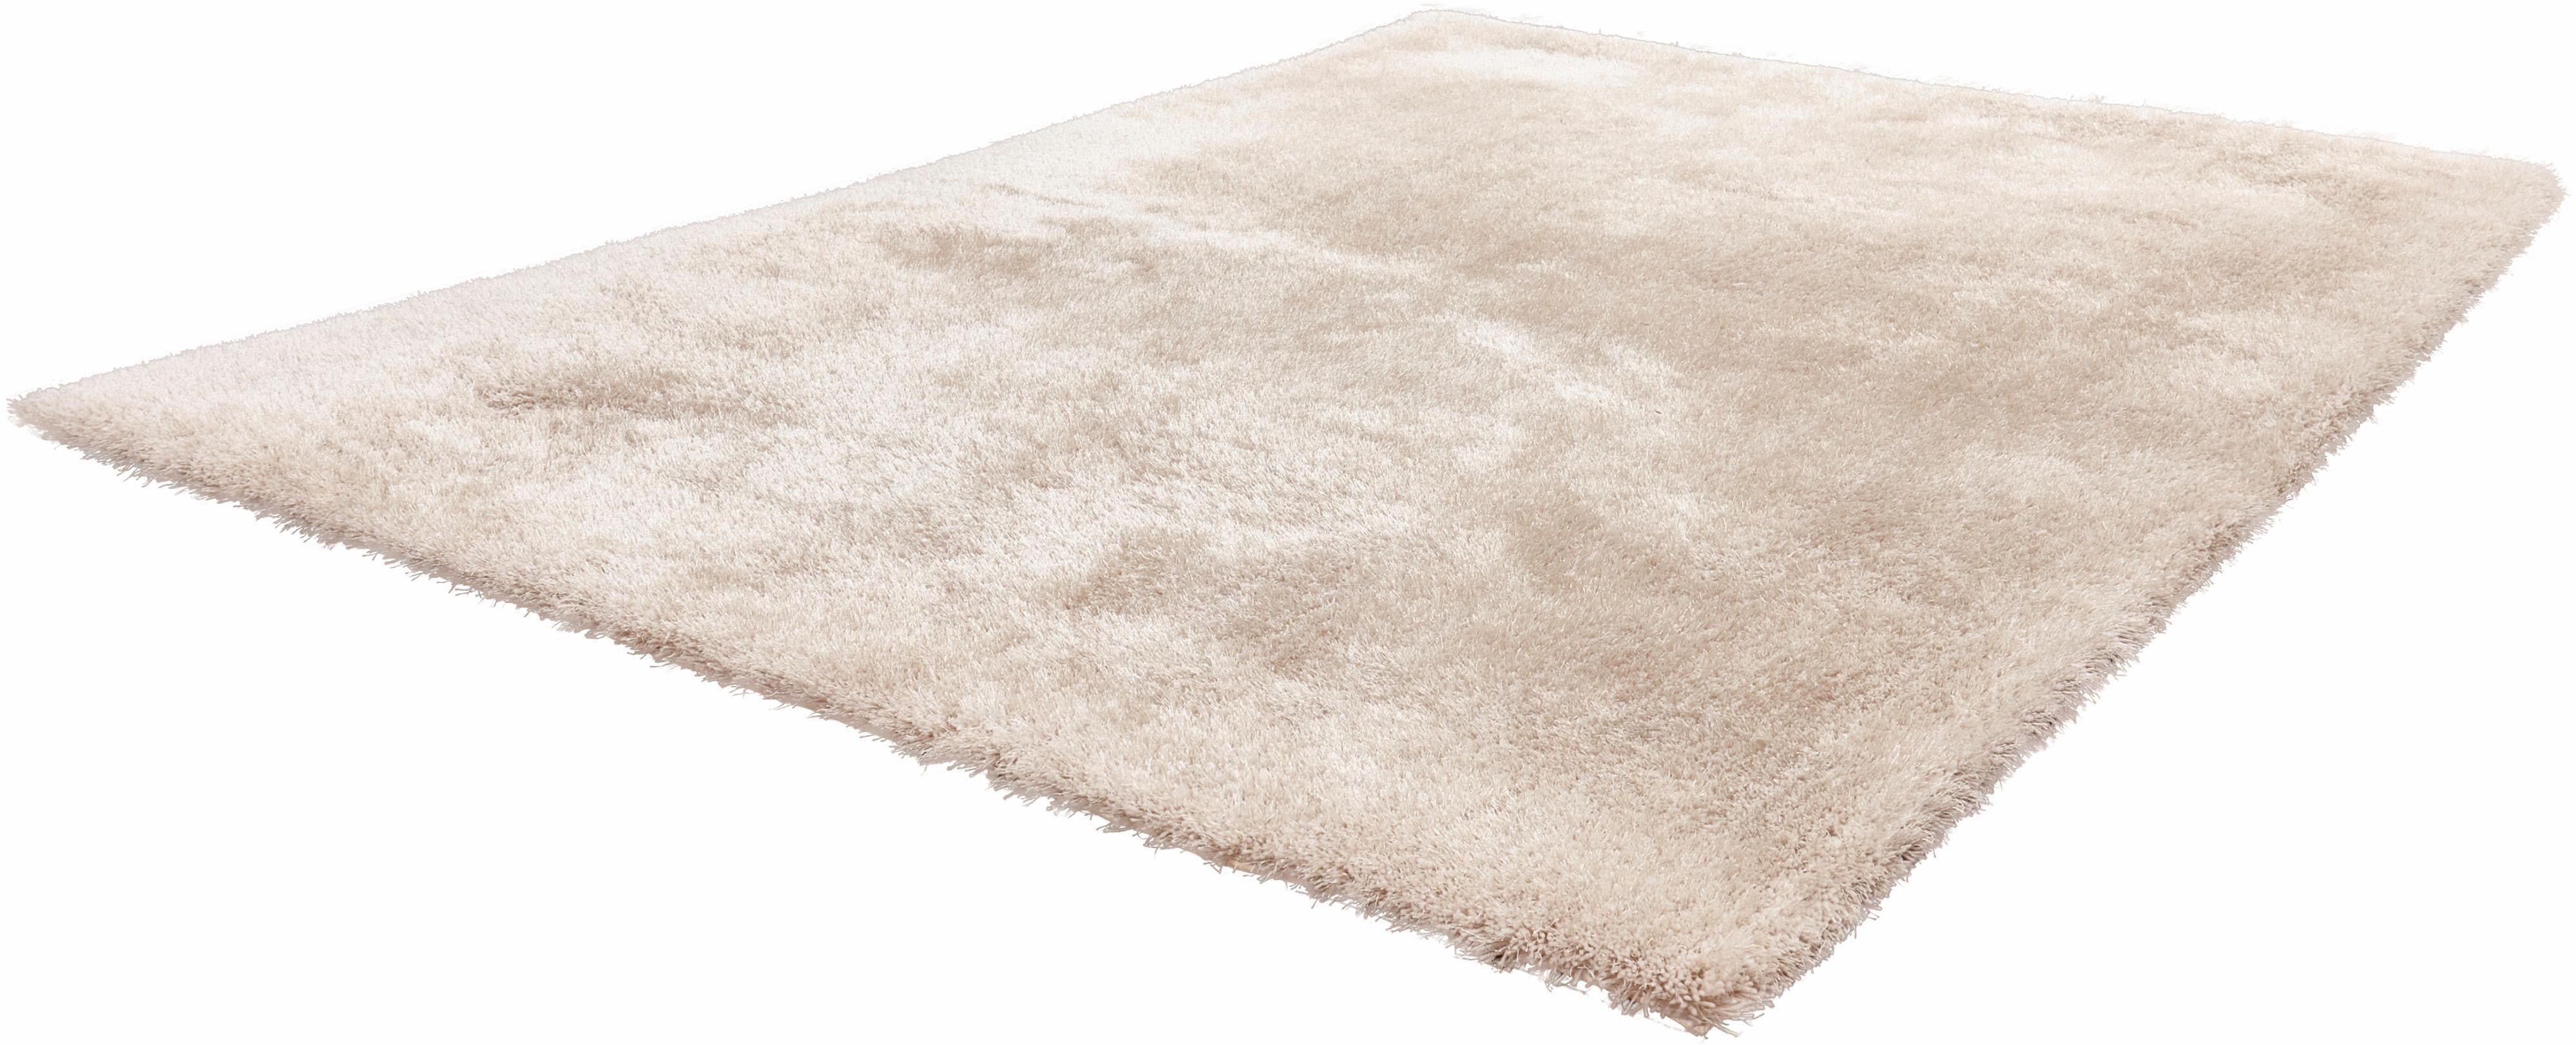 Hochflor-Teppich Kayoom Royal Kayoom rechteckig Höhe 40 mm handgetuftet